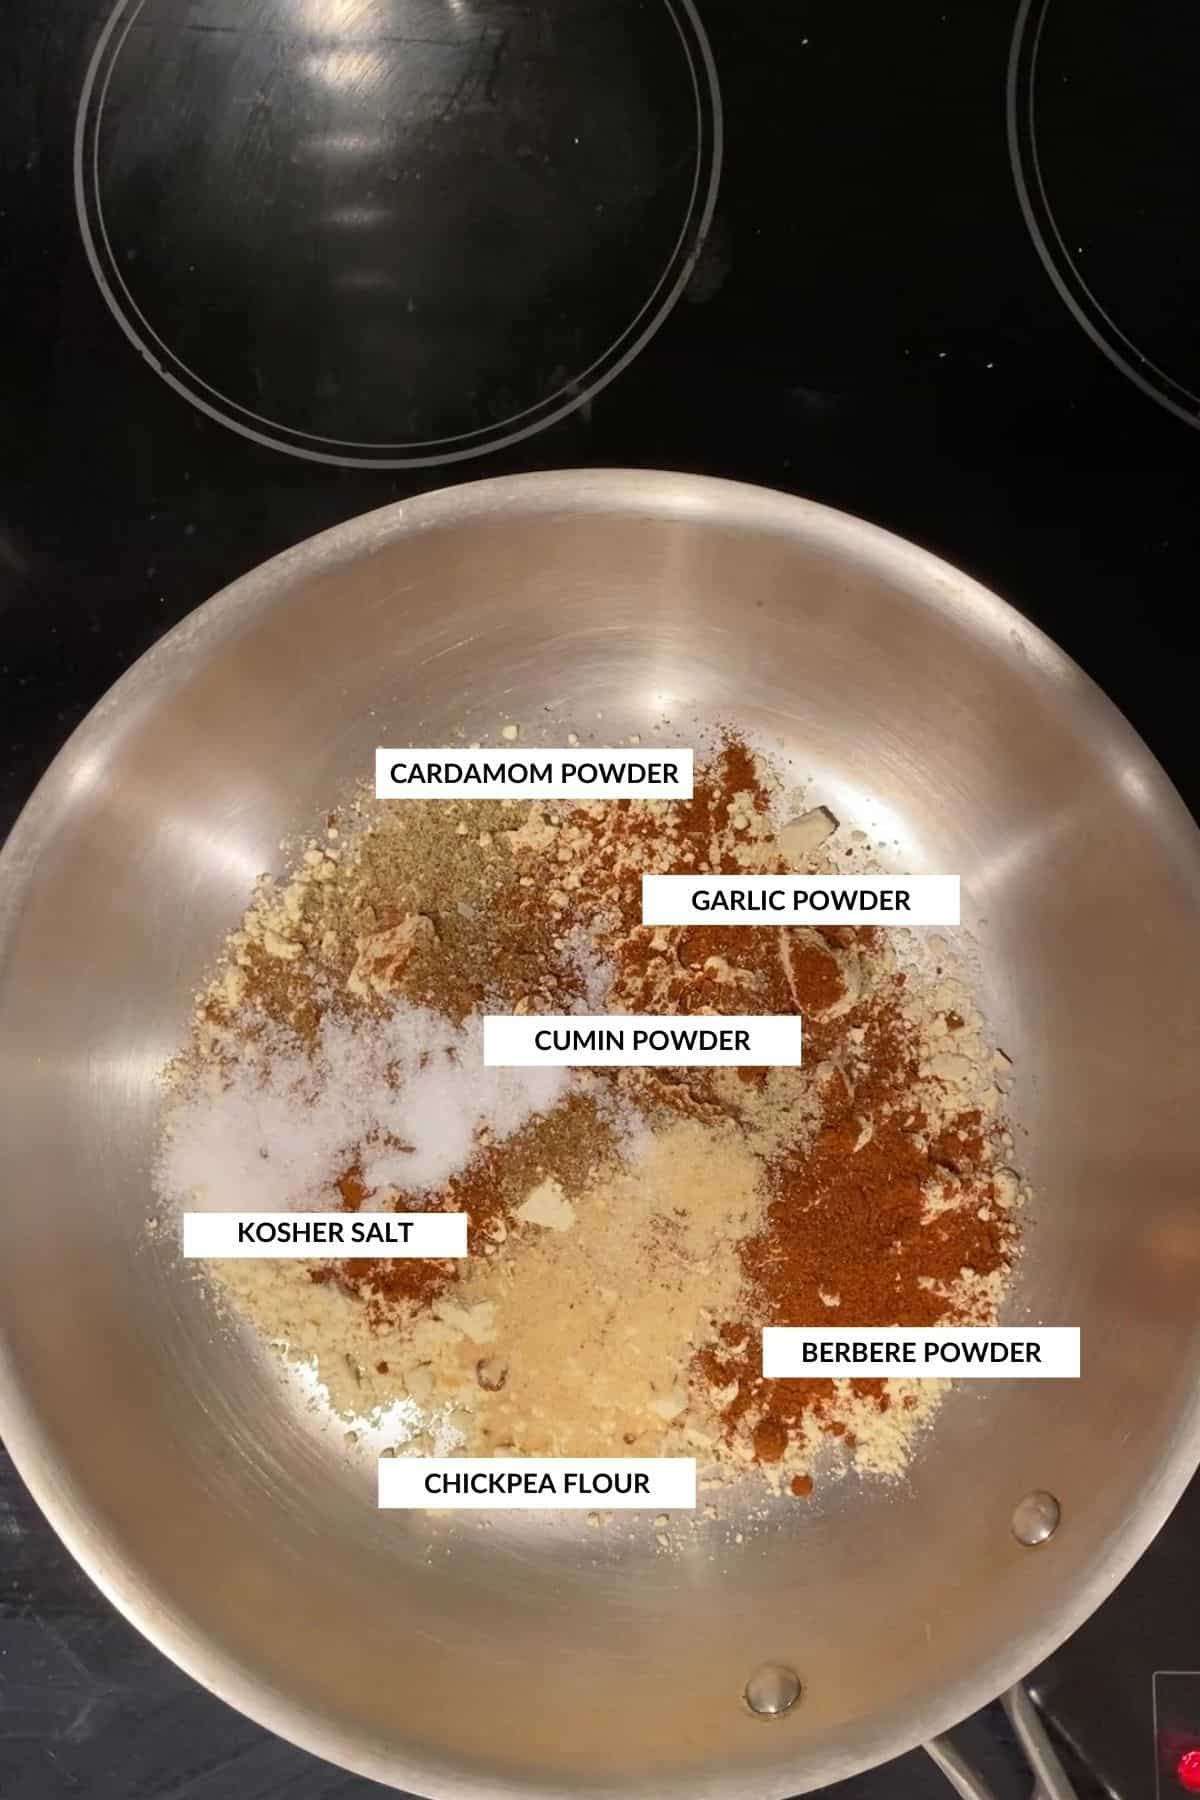 Labeled image showing how to make shiro powder (chickpea flour, berbere, cumin, cardamom, garlic powder, and salt)